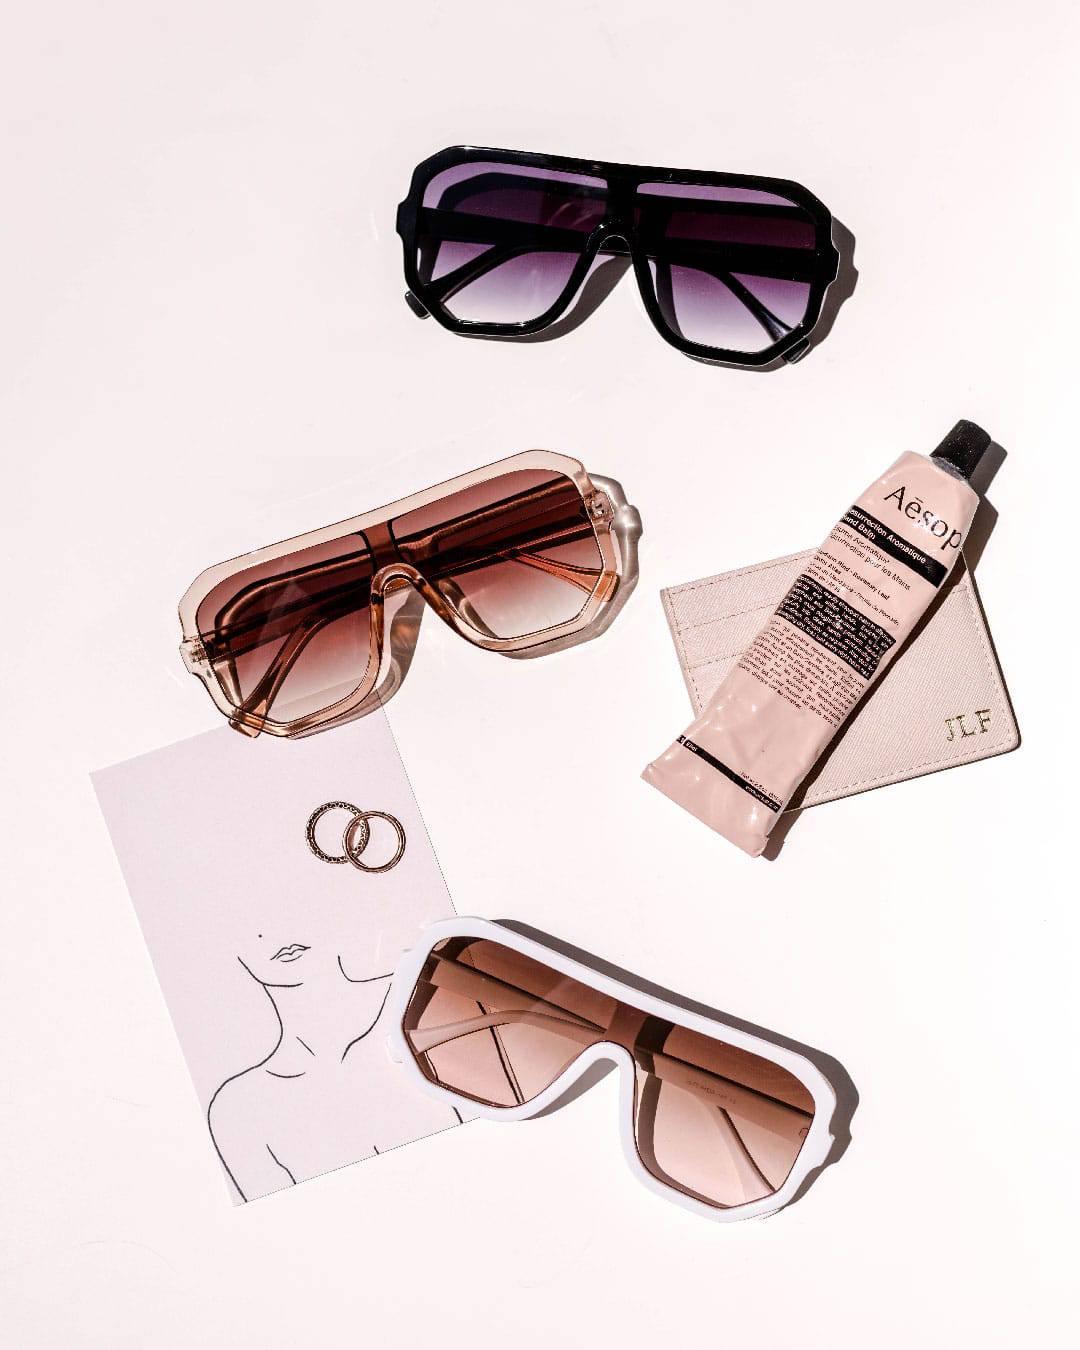 Zara-Shades-Group-Shot